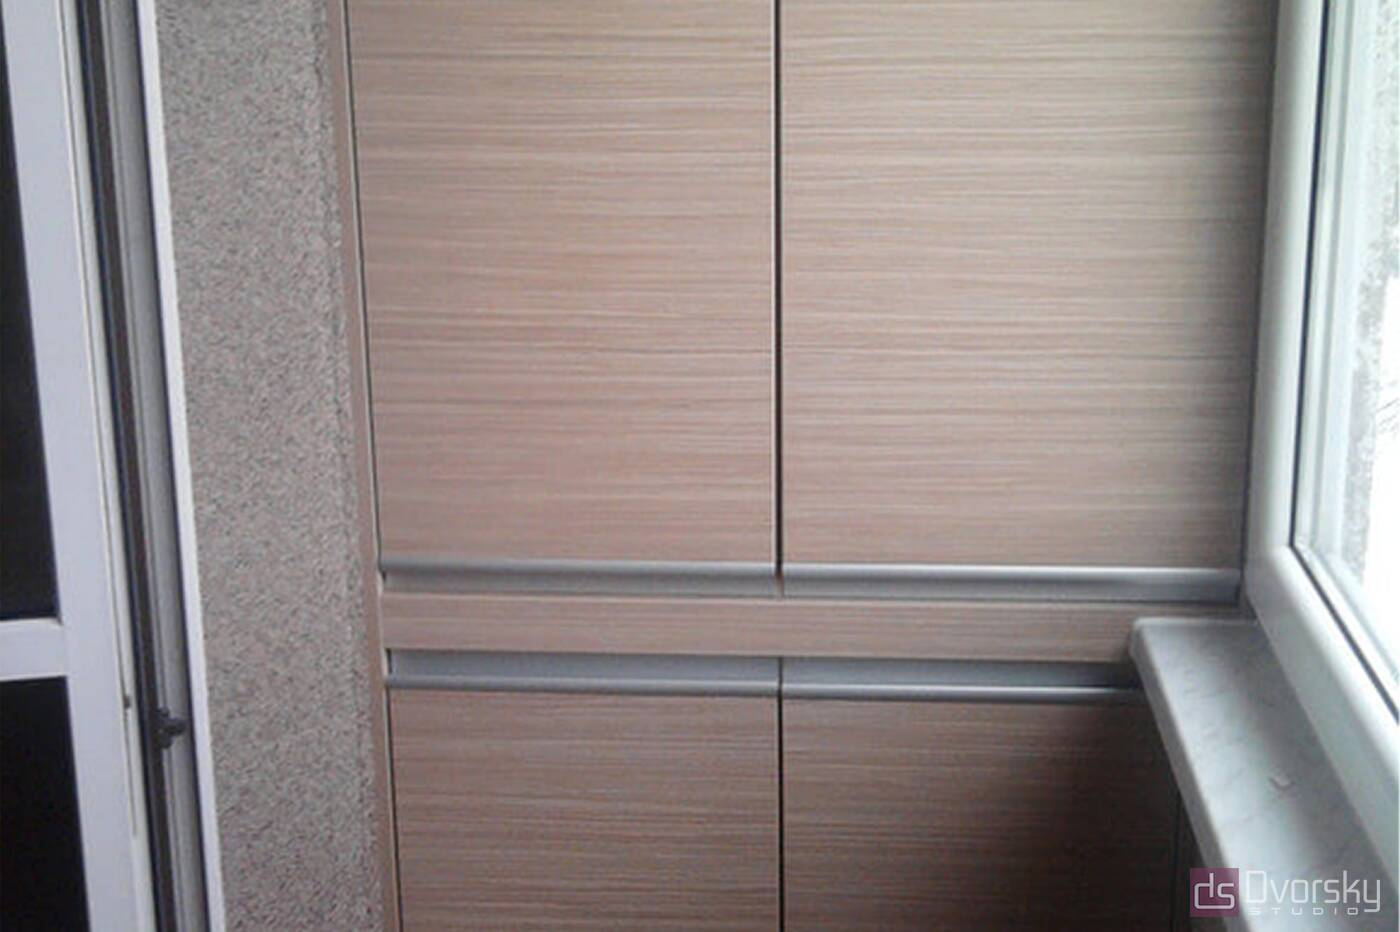 Мебель на балкон Балкон с гладким шкафом - Фото № 1